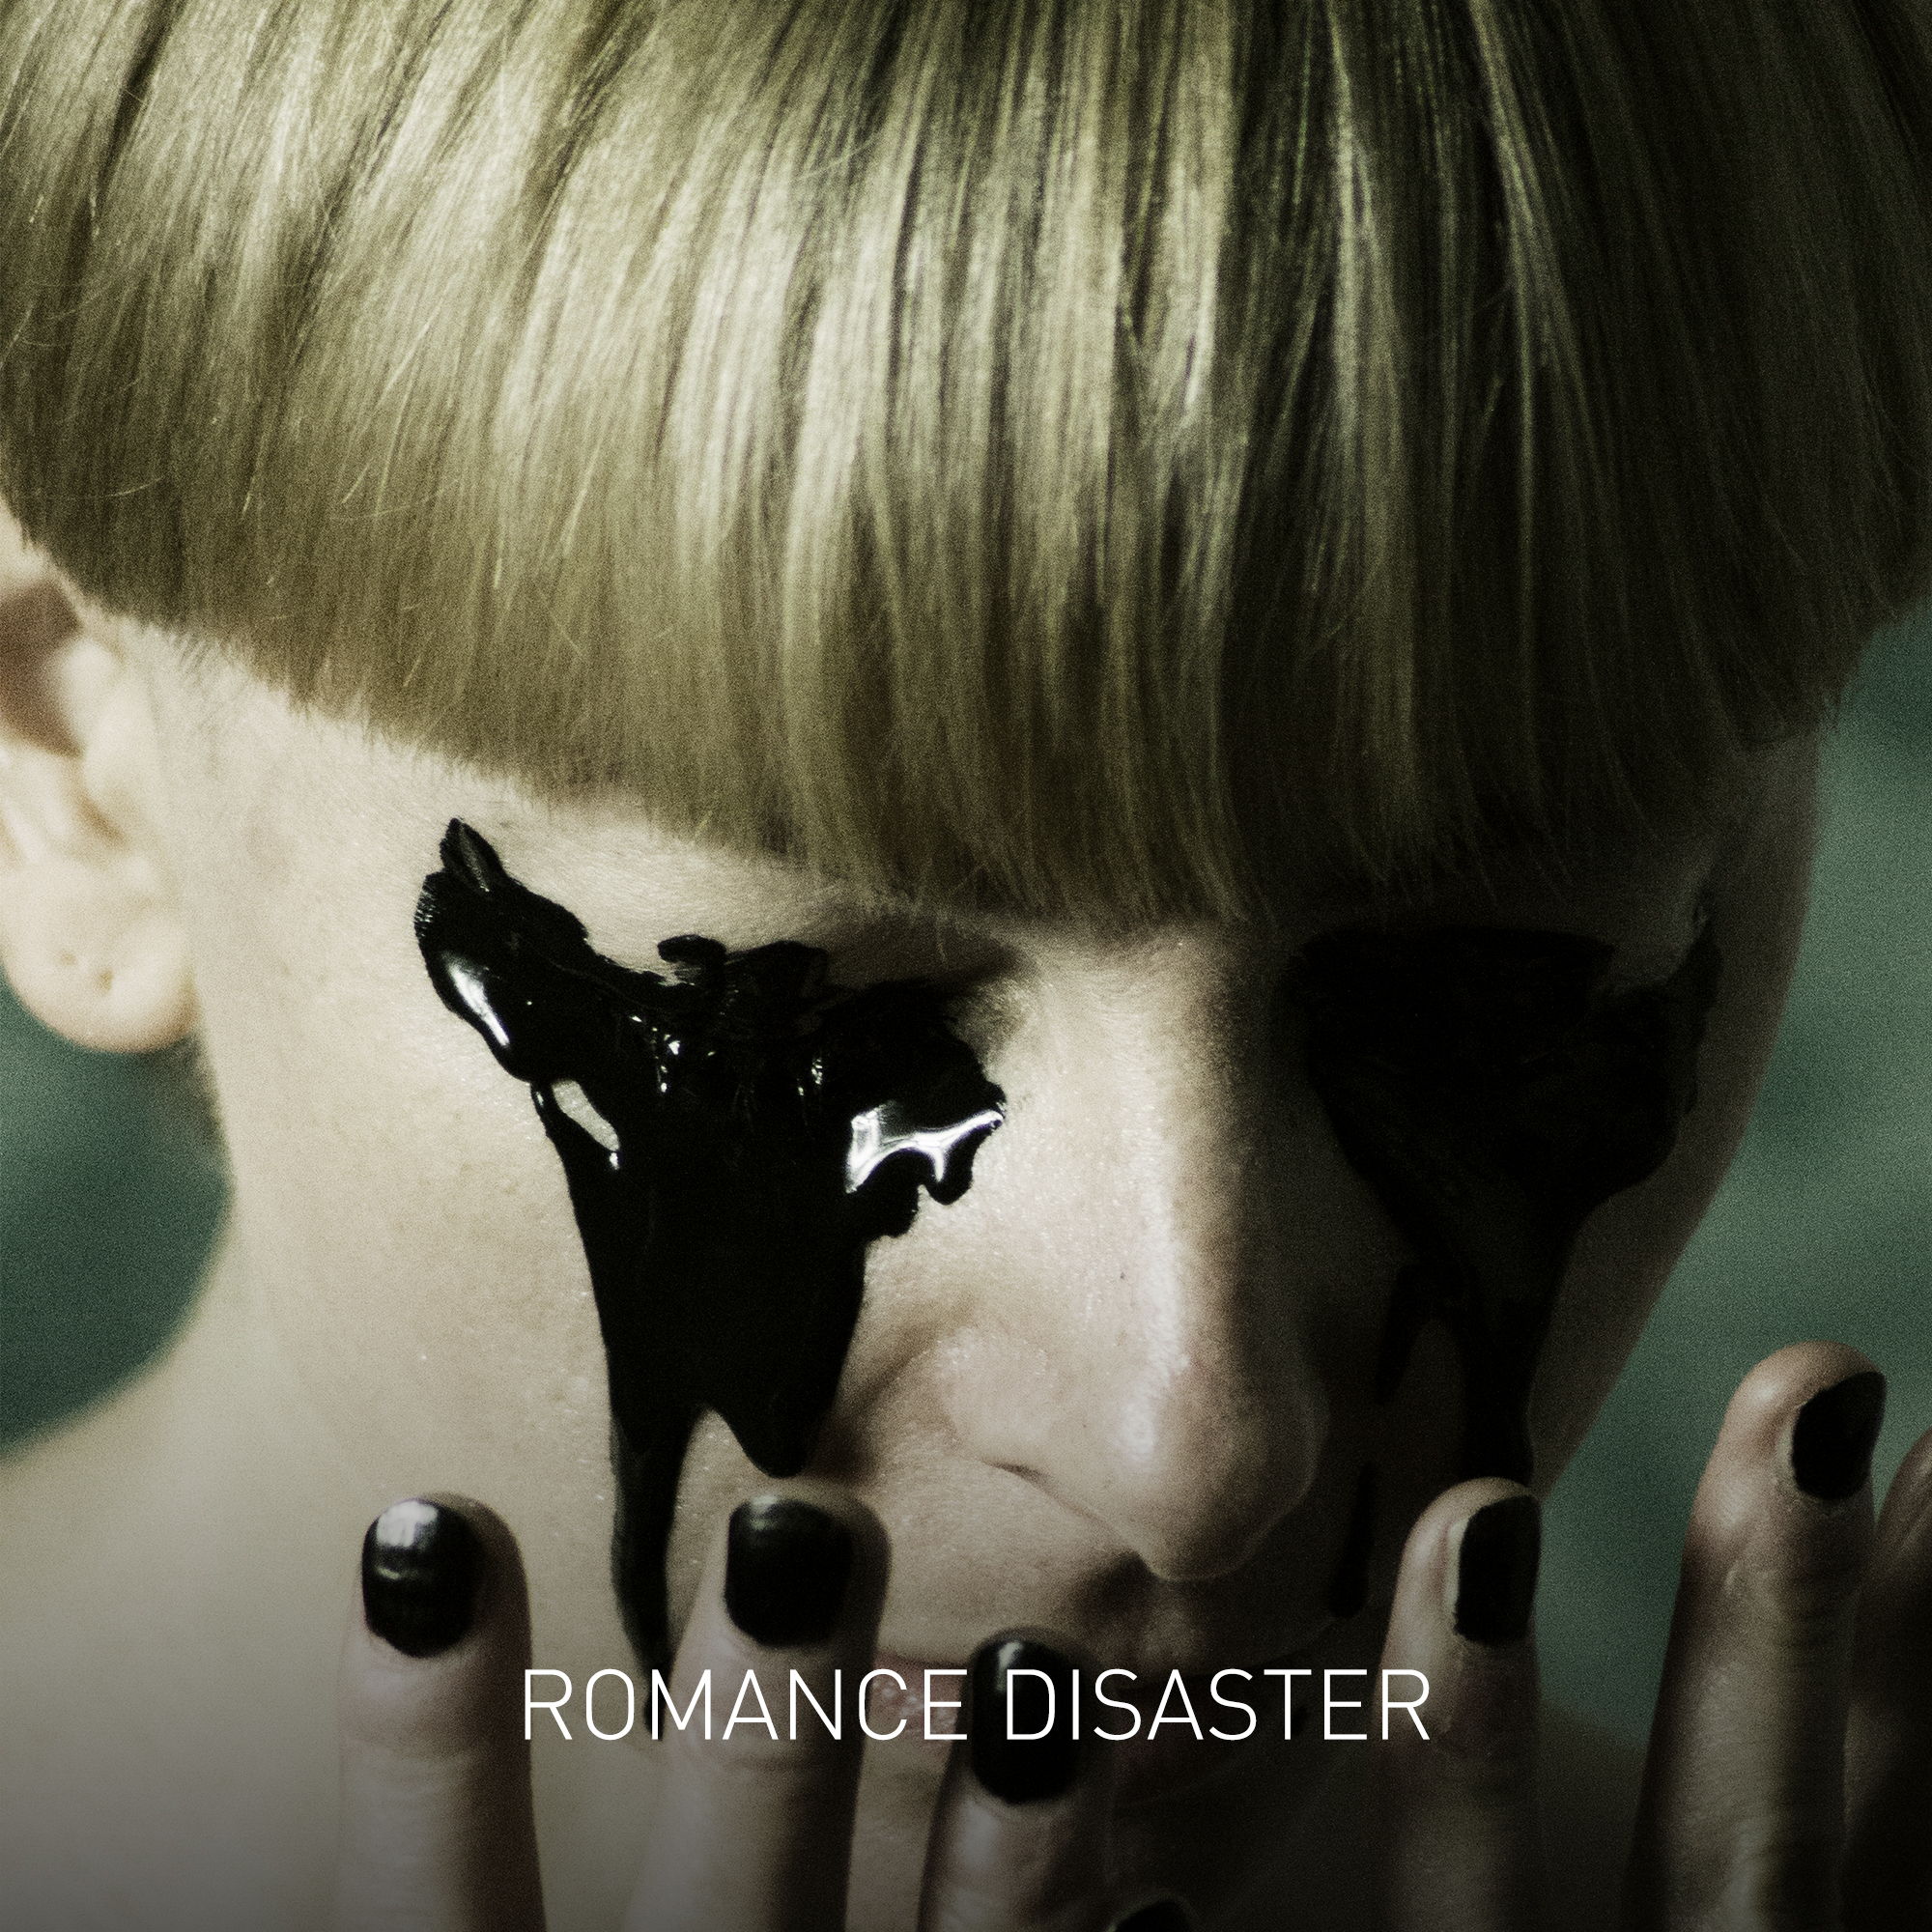 Romance Disaster